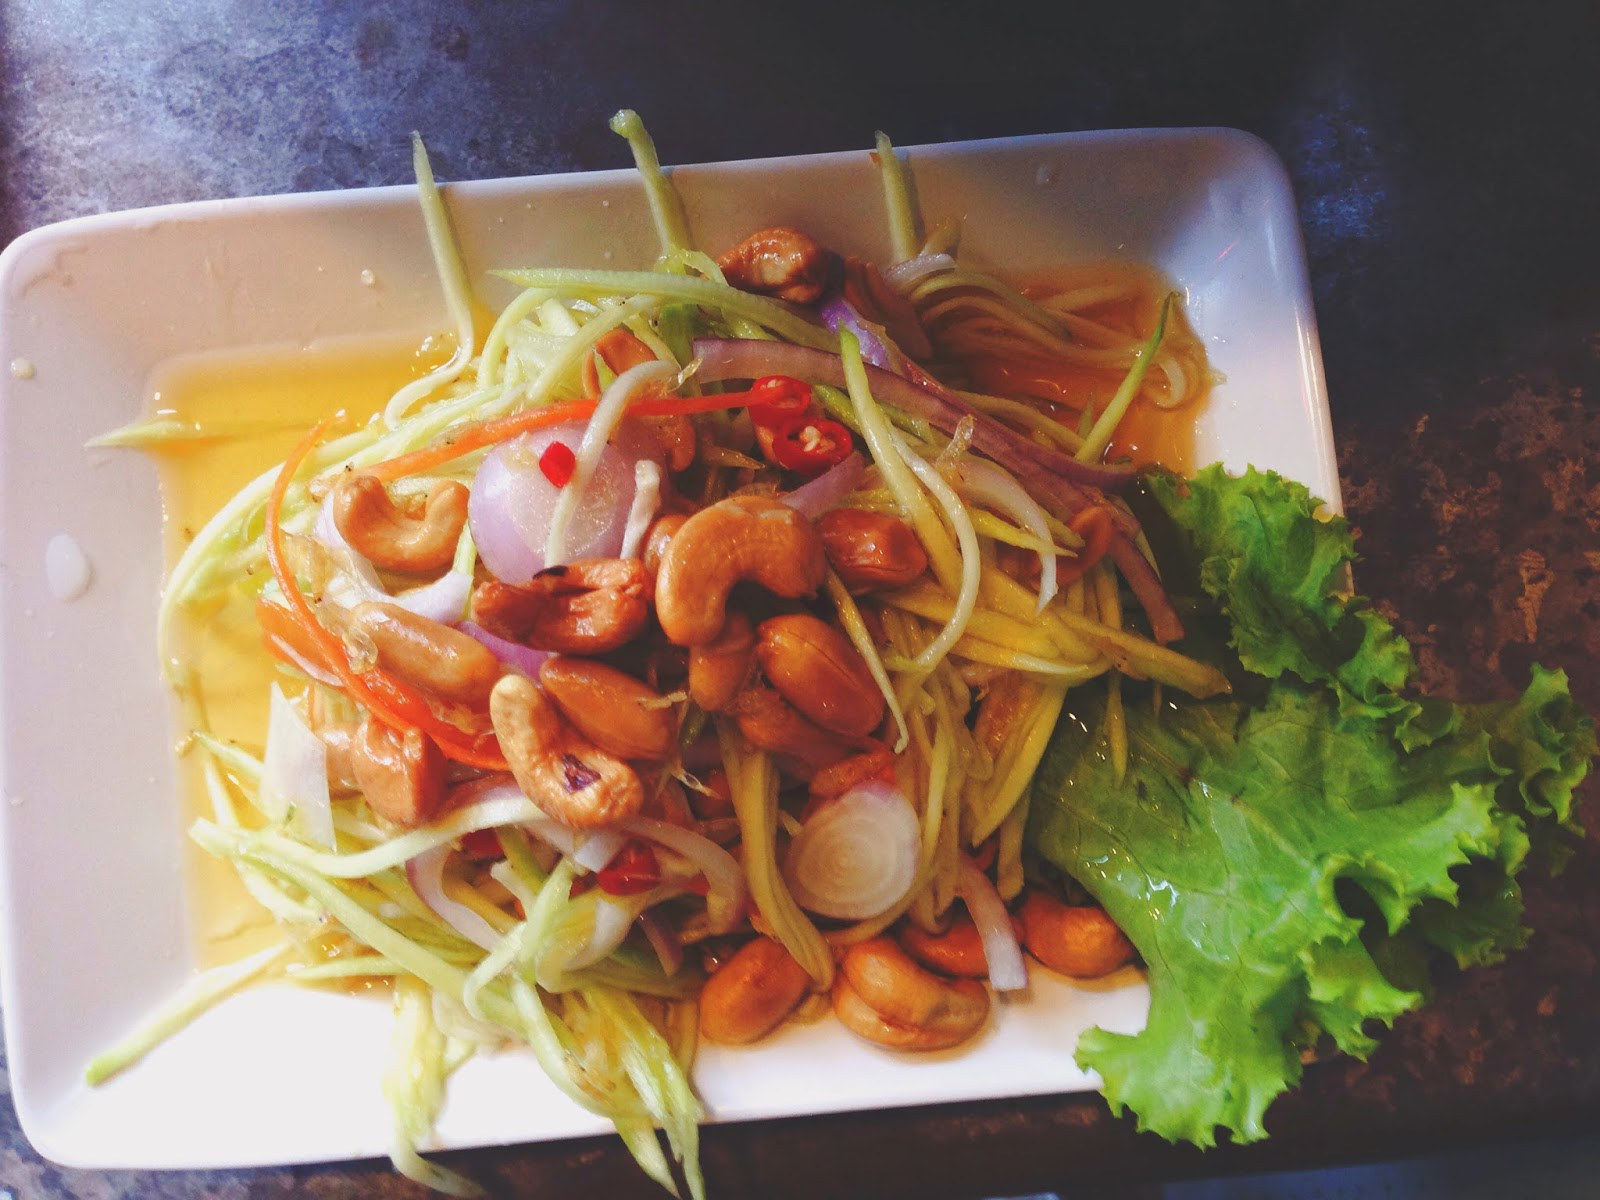 Tom Yum Kungfu Mookata Boat Quay Mango Salad